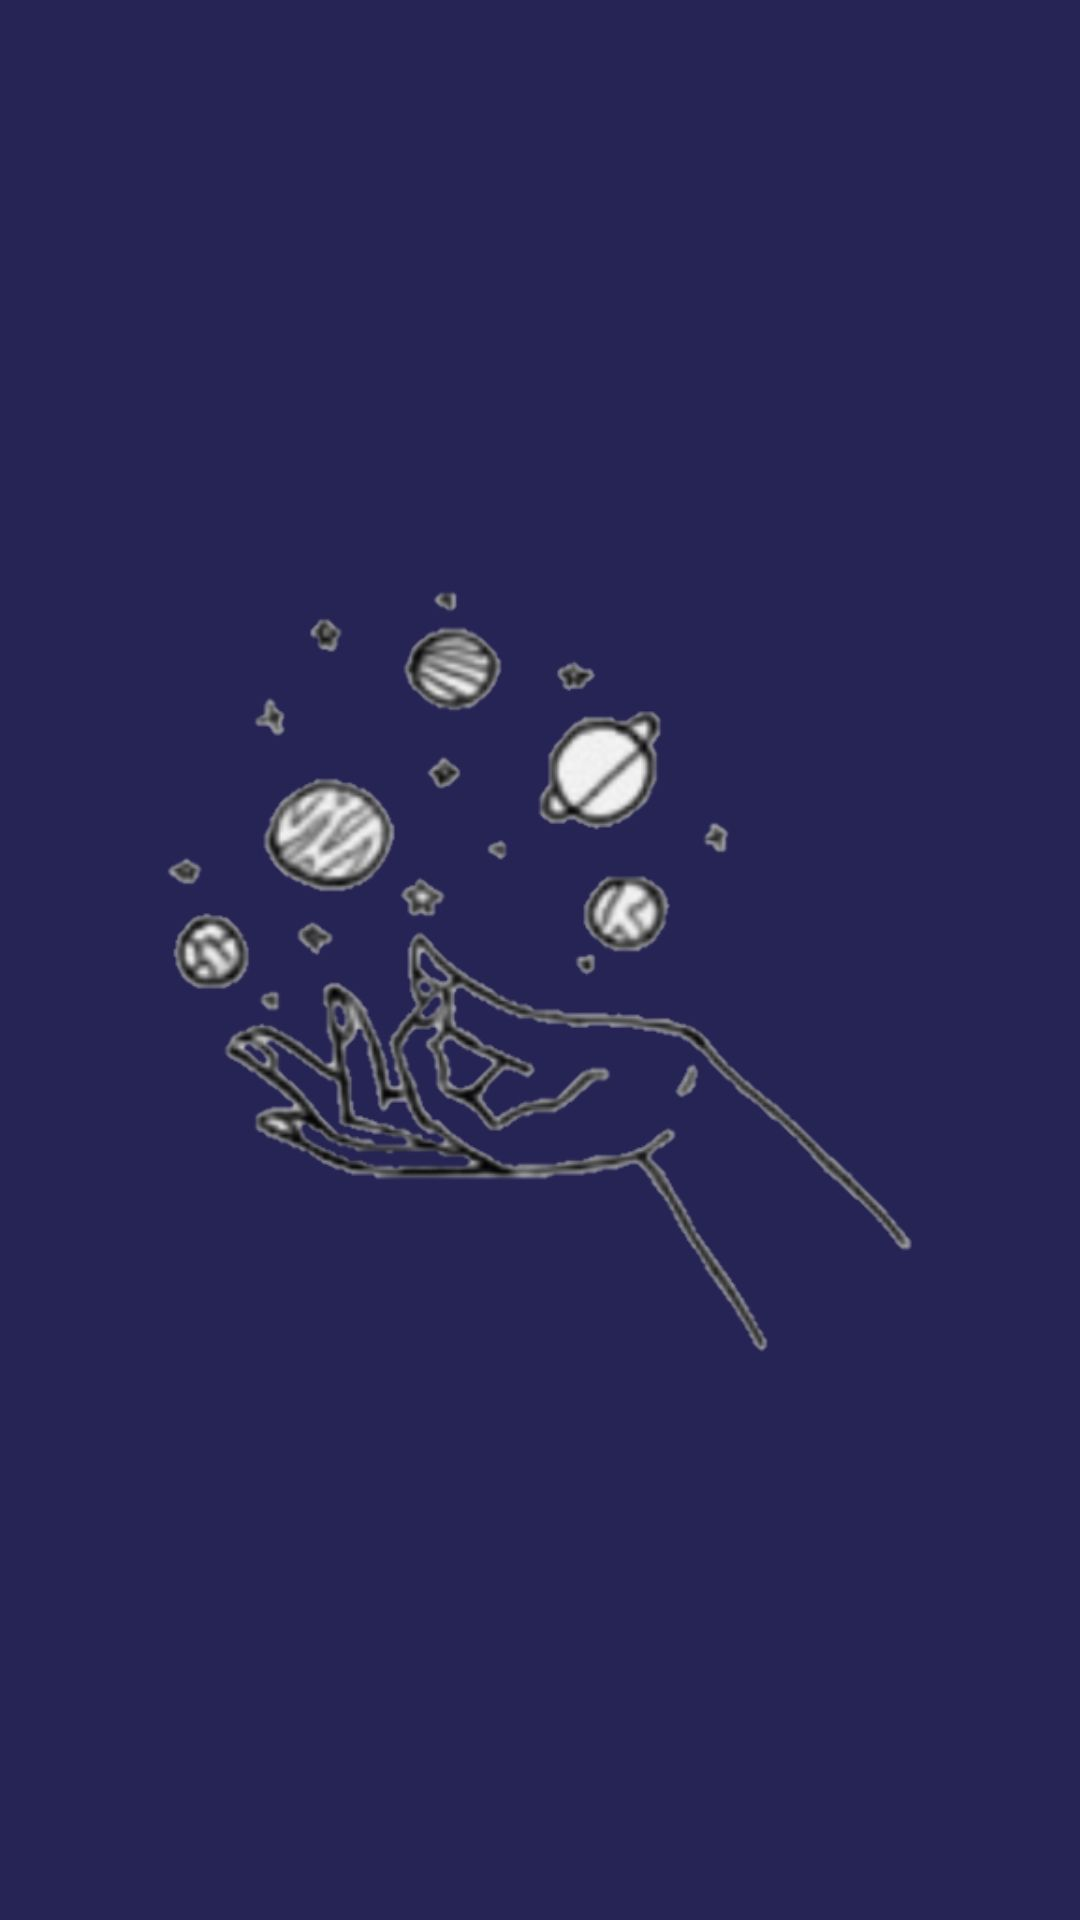 Planets Outline Blue Navy Solarsystem Tumblr Tumblrposts